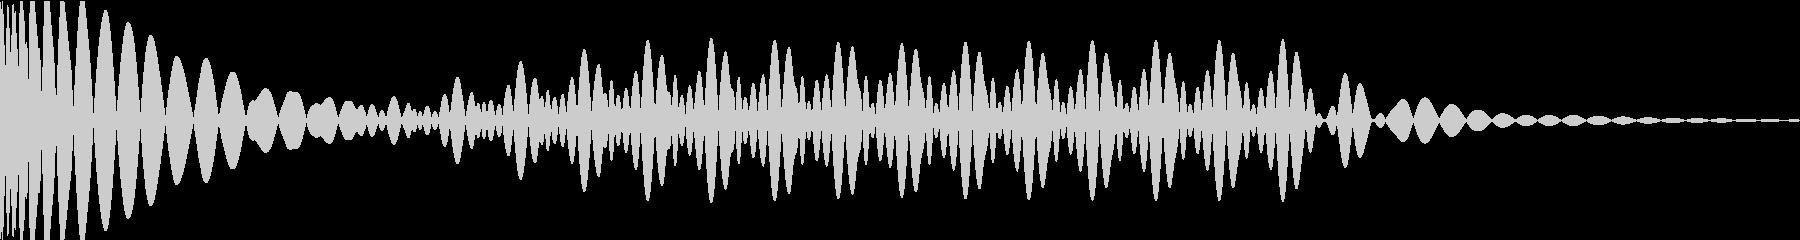 EDMキック キーD#の未再生の波形